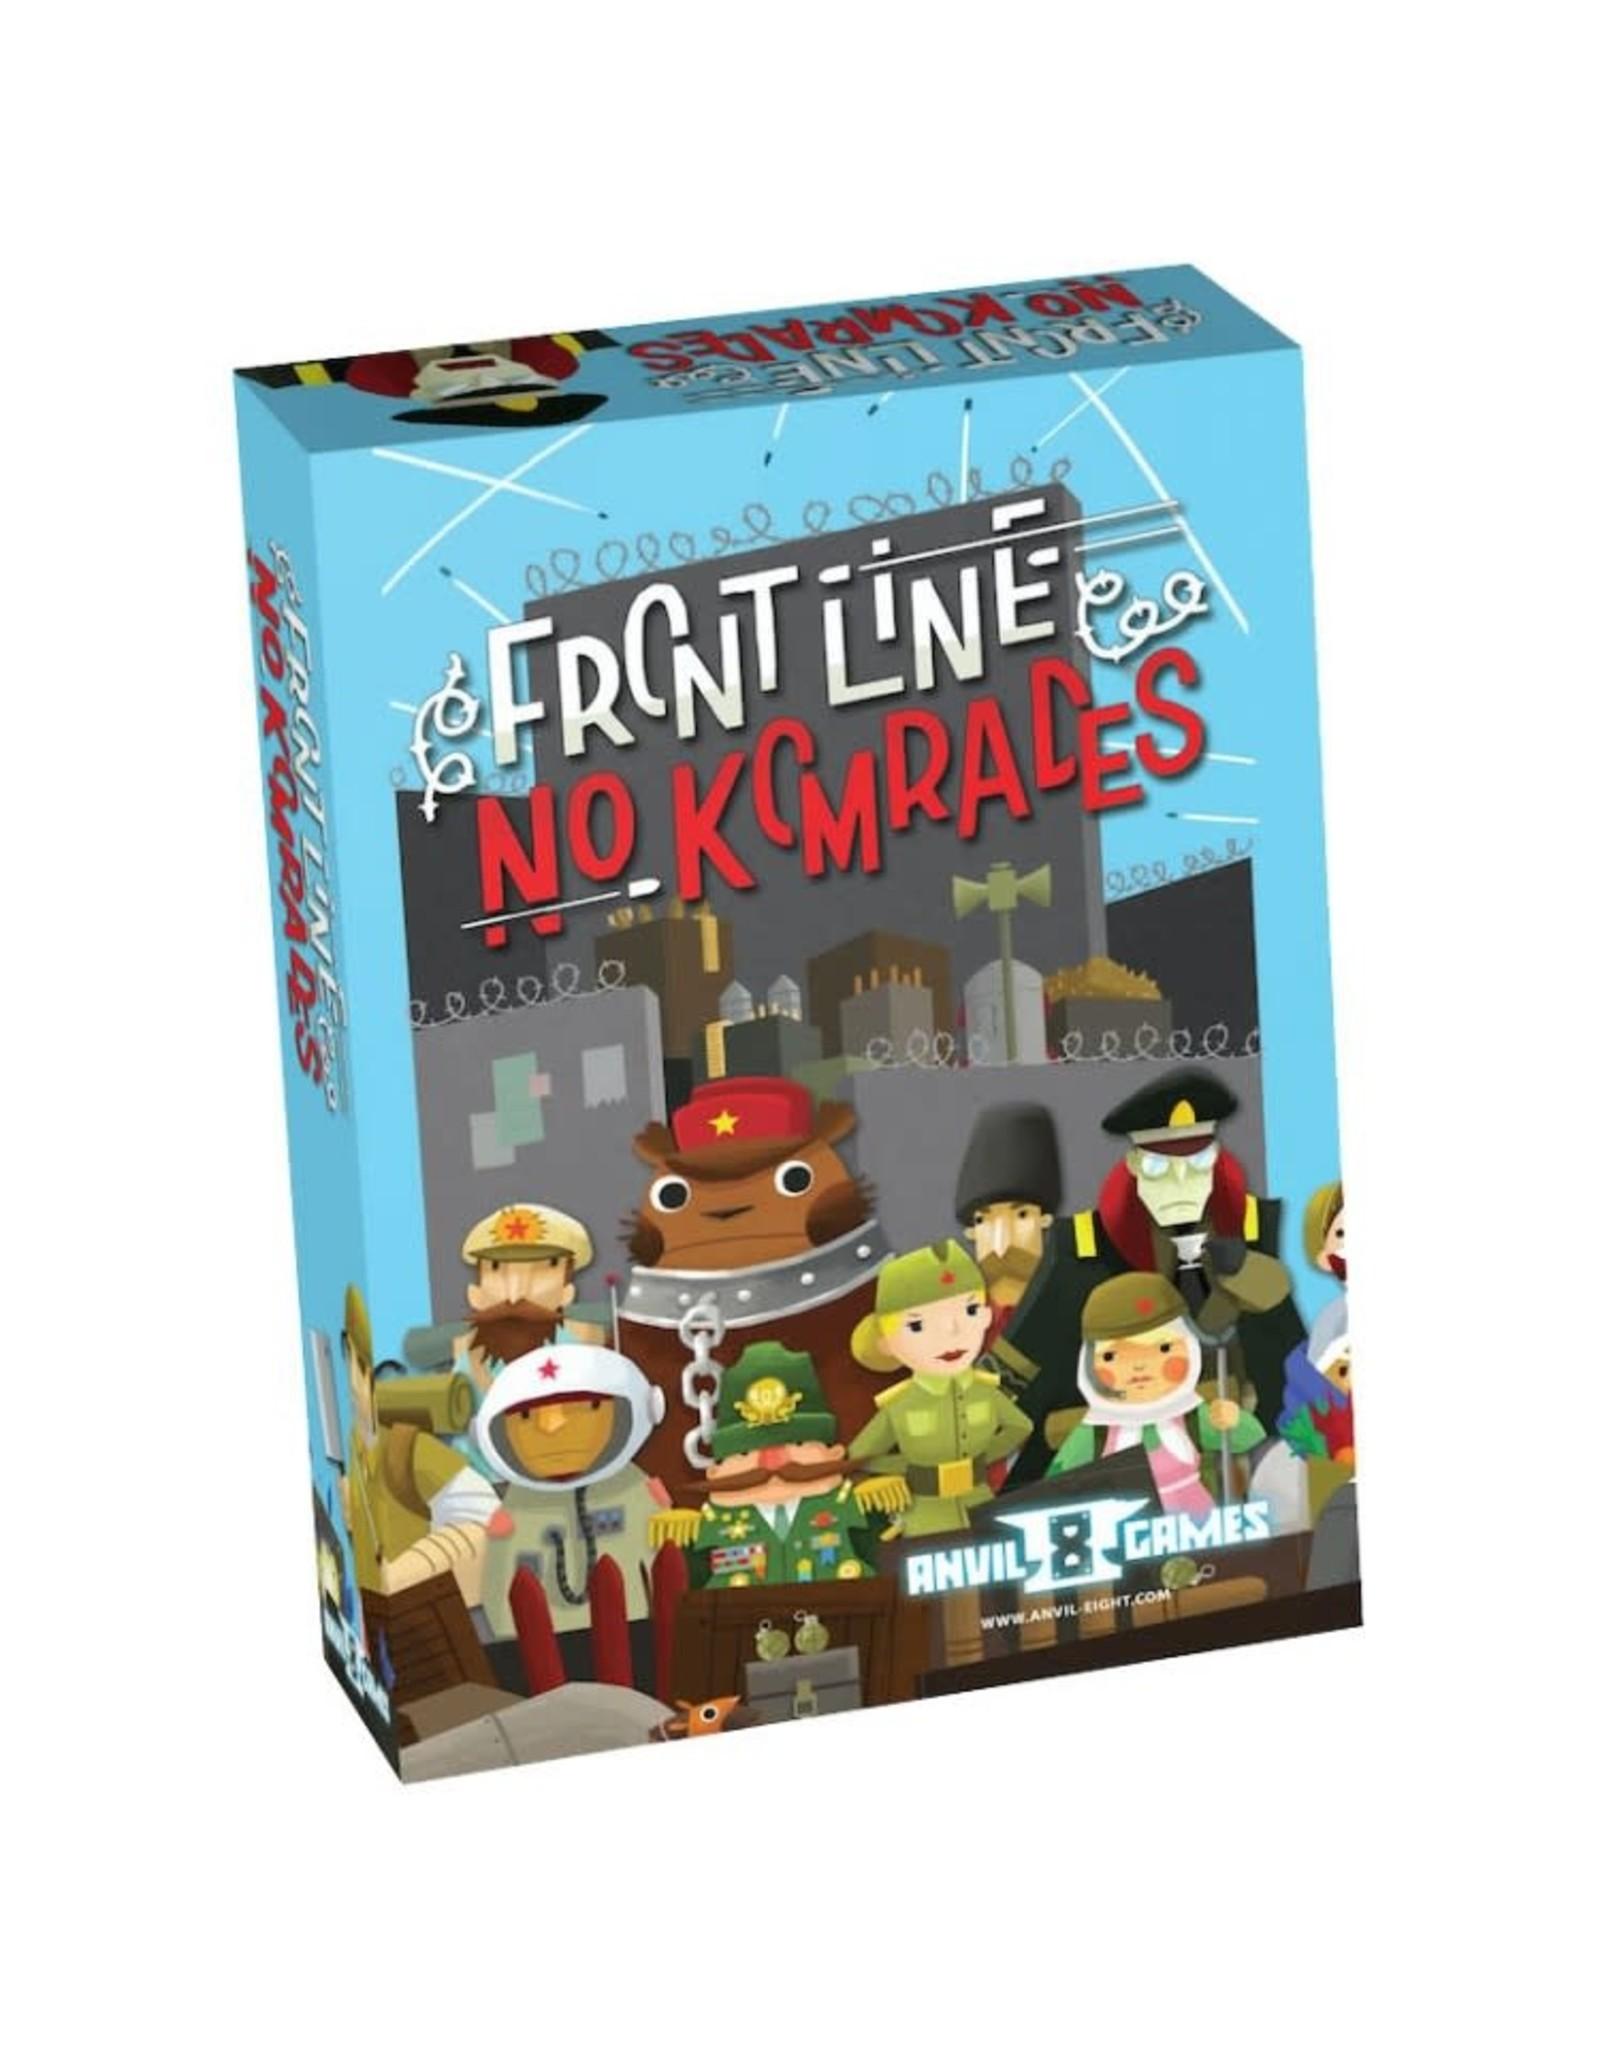 Anvil 8 Games Front Line: No Komrades